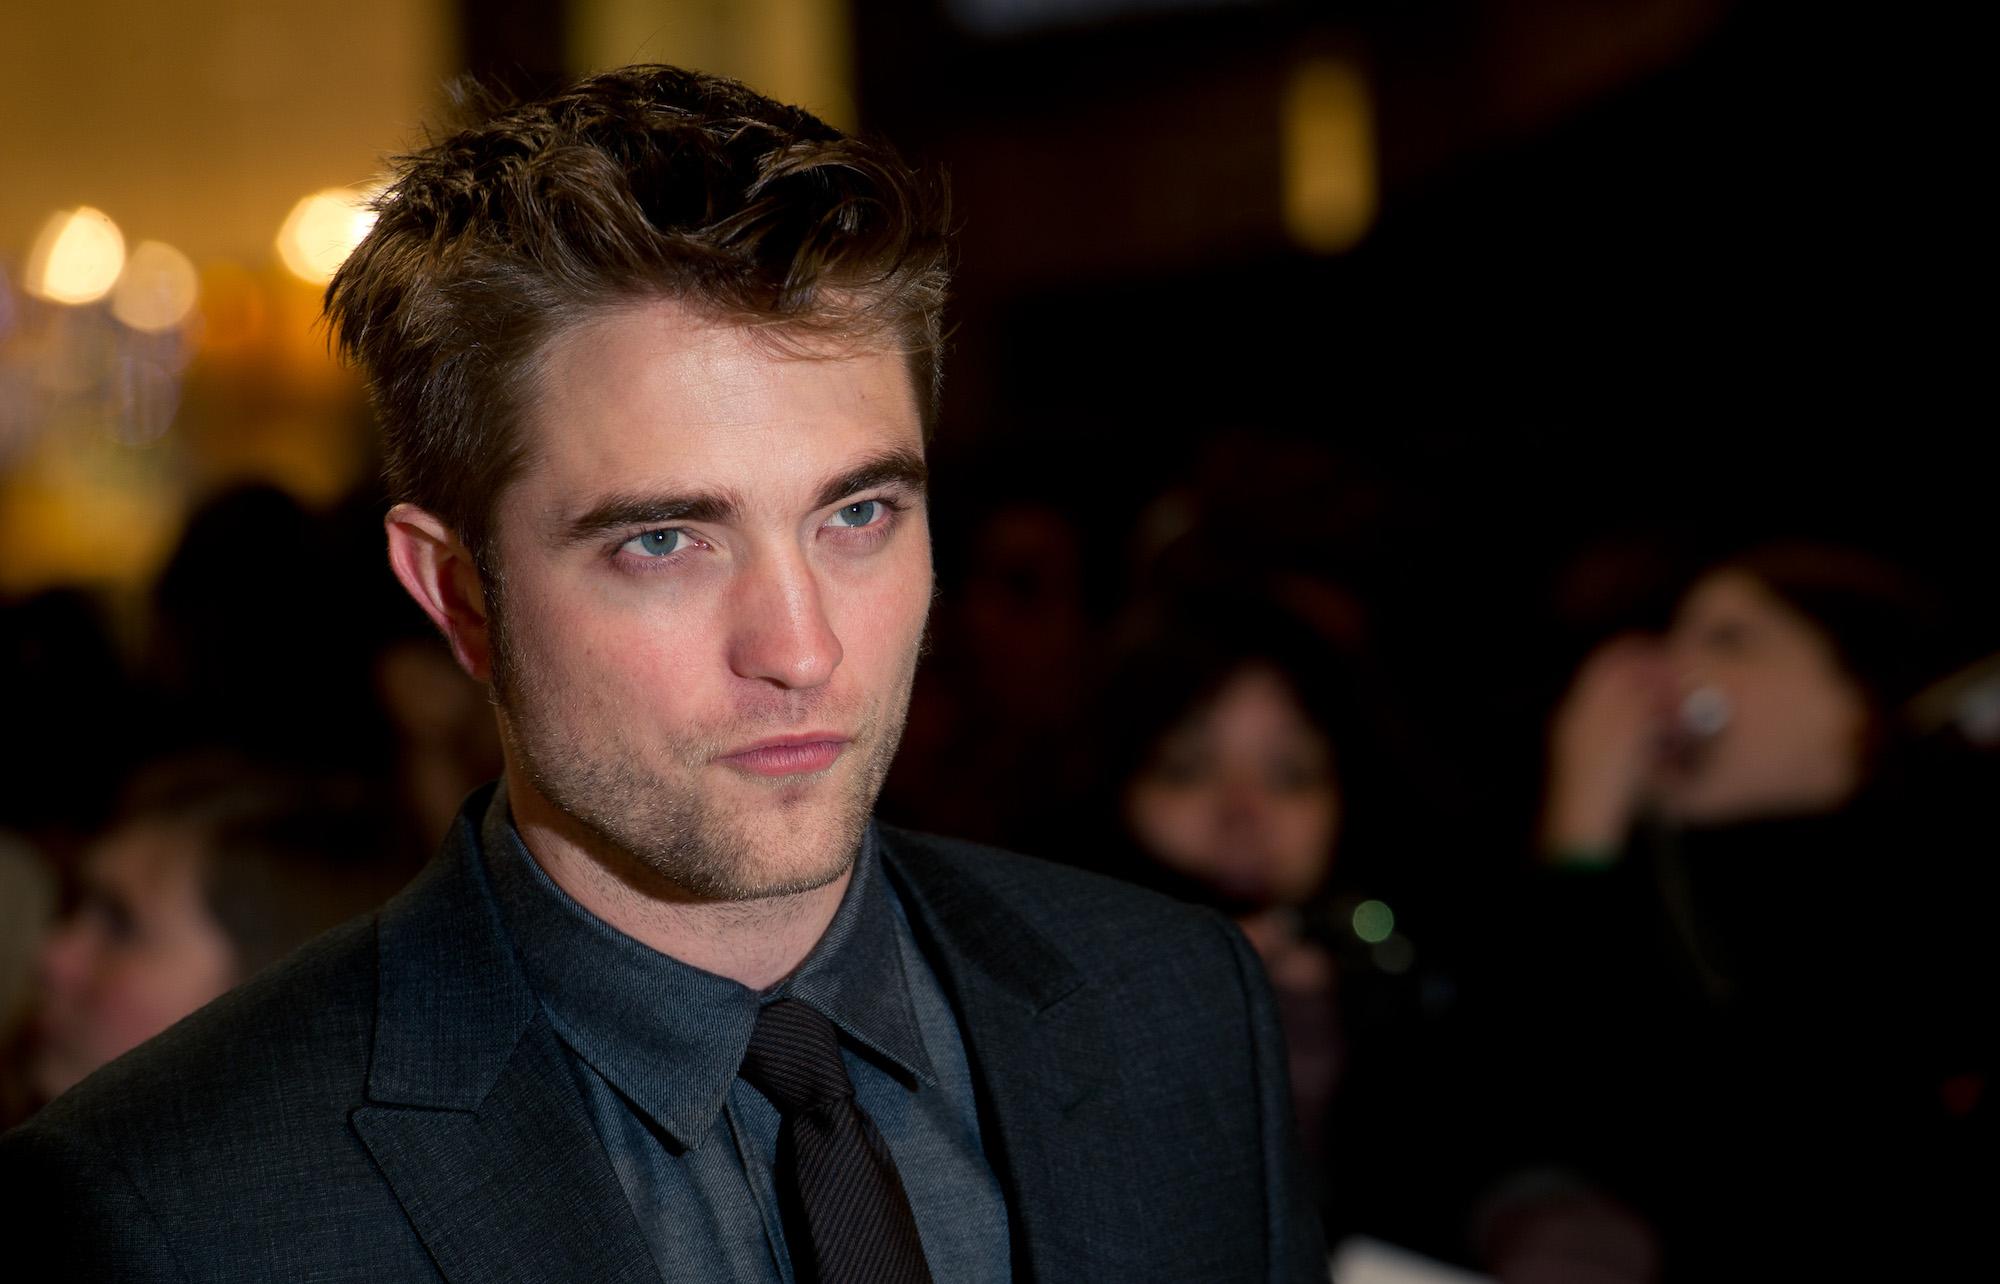 Robert Pattinson at the UK premiere of 'The Twilight Saga: Breaking Dawn Part 1' on Nov. 16, 2011